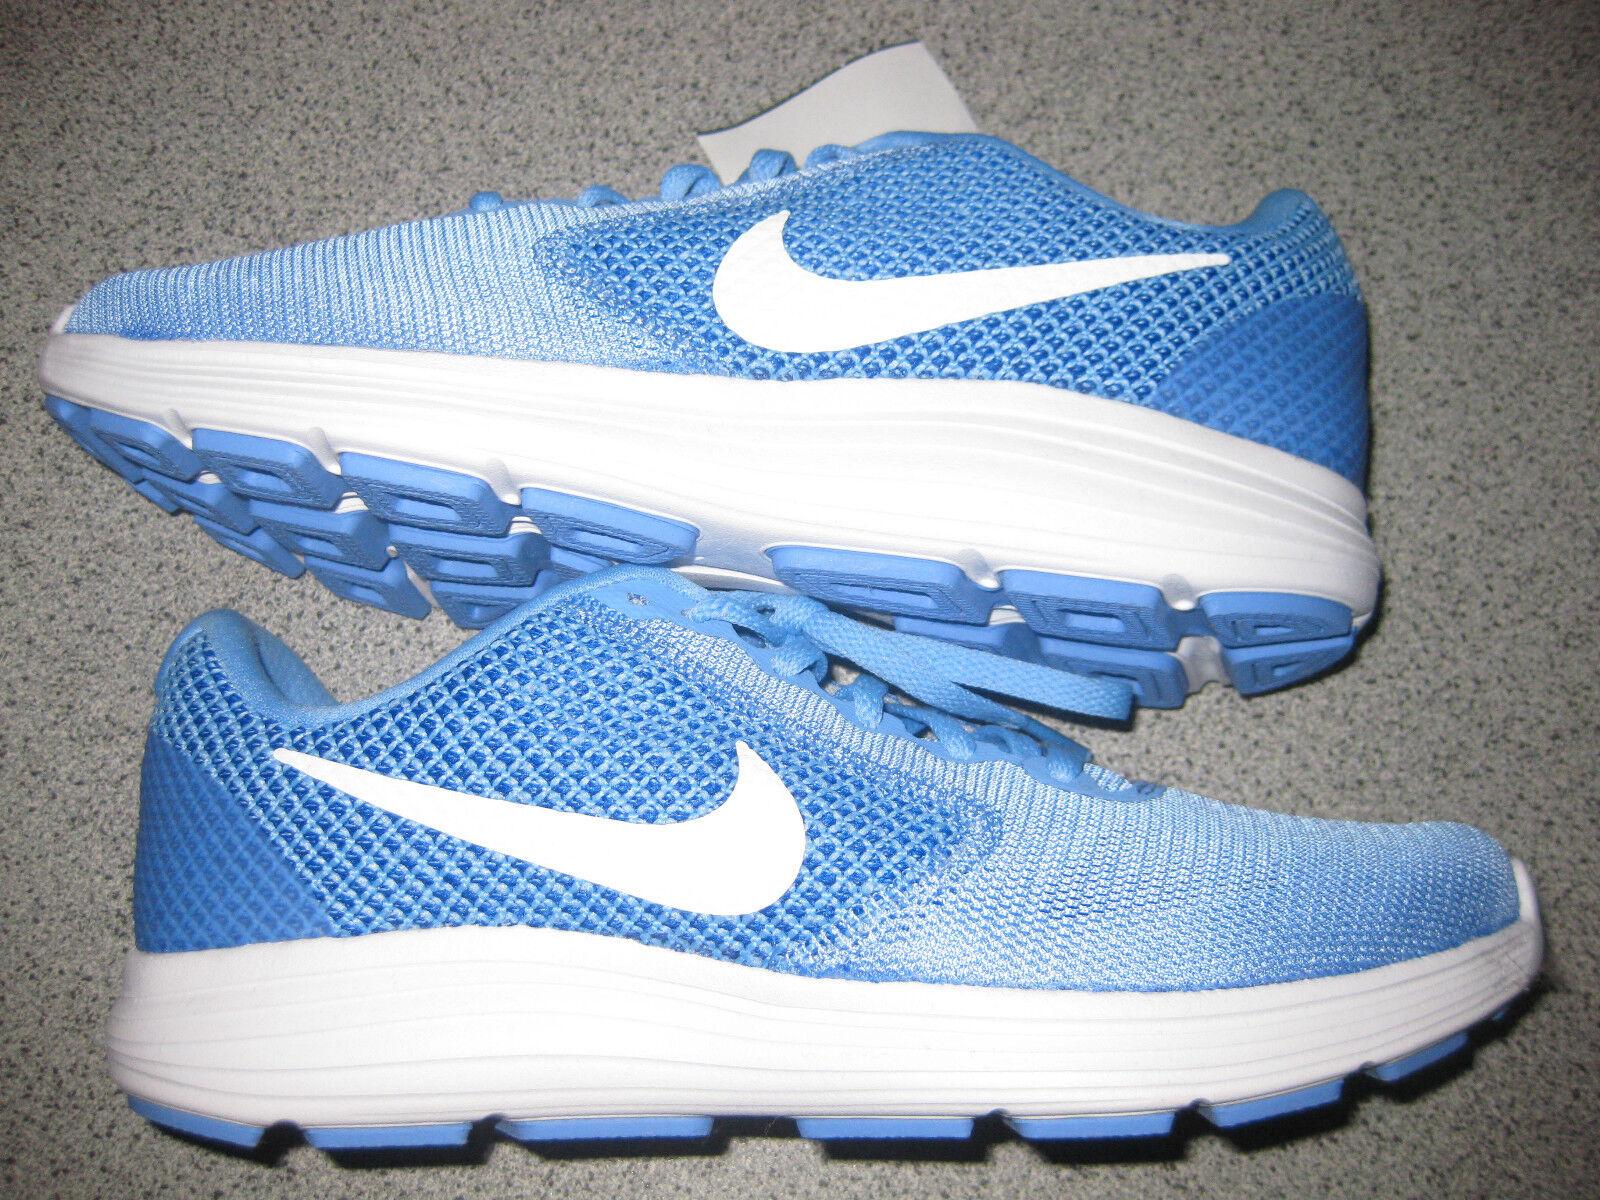 NIKE Damen Running Sneaker chalk 819303 400 REVOLUTION 3 chalk Sneaker blue 38,5 Blau NEU OVP b5c514